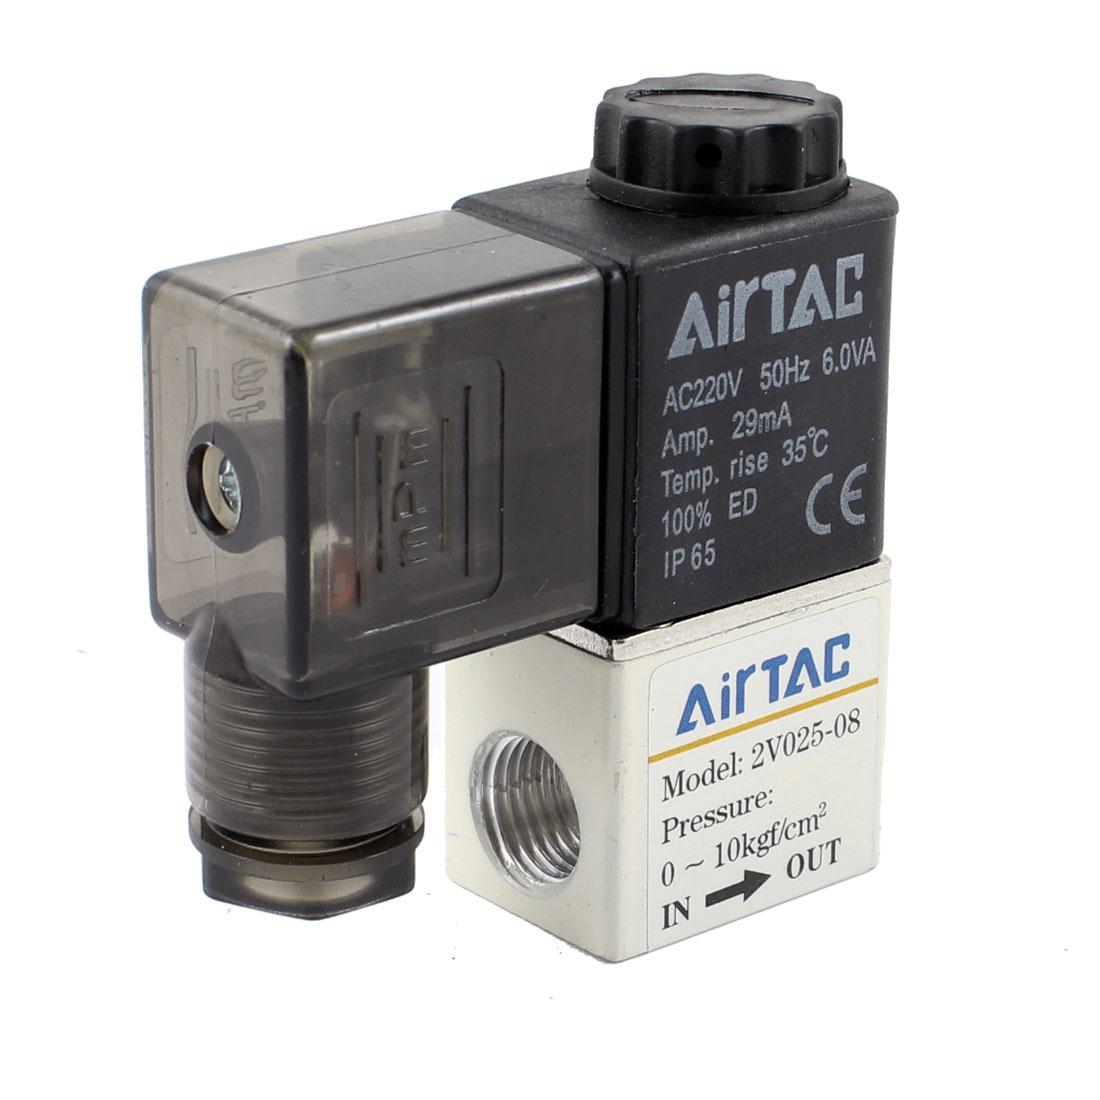 Black Electrical Pneumatic Control Air Solenoid Valve Coil AC220V 50HZ 6VA